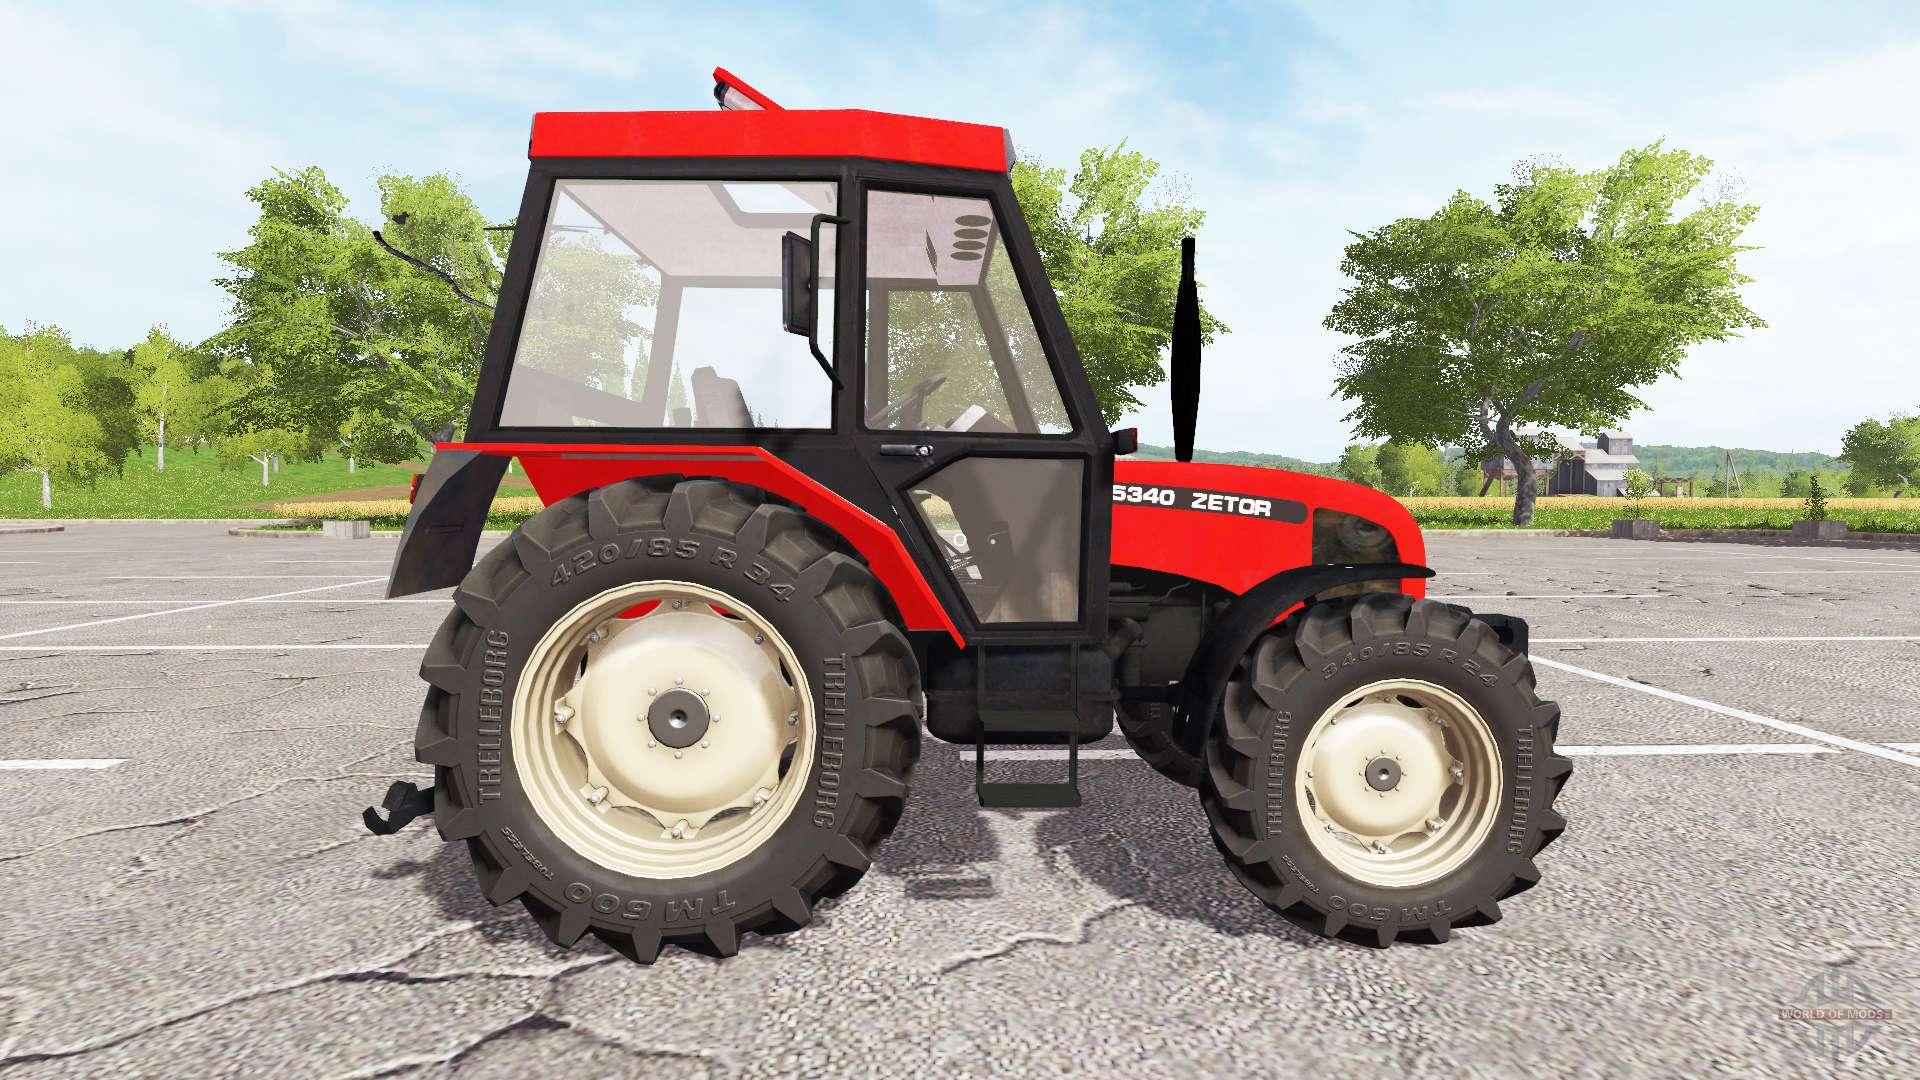 farm fuel filters zetor 5340 for farming simulator 2017  zetor 5340 for farming simulator 2017